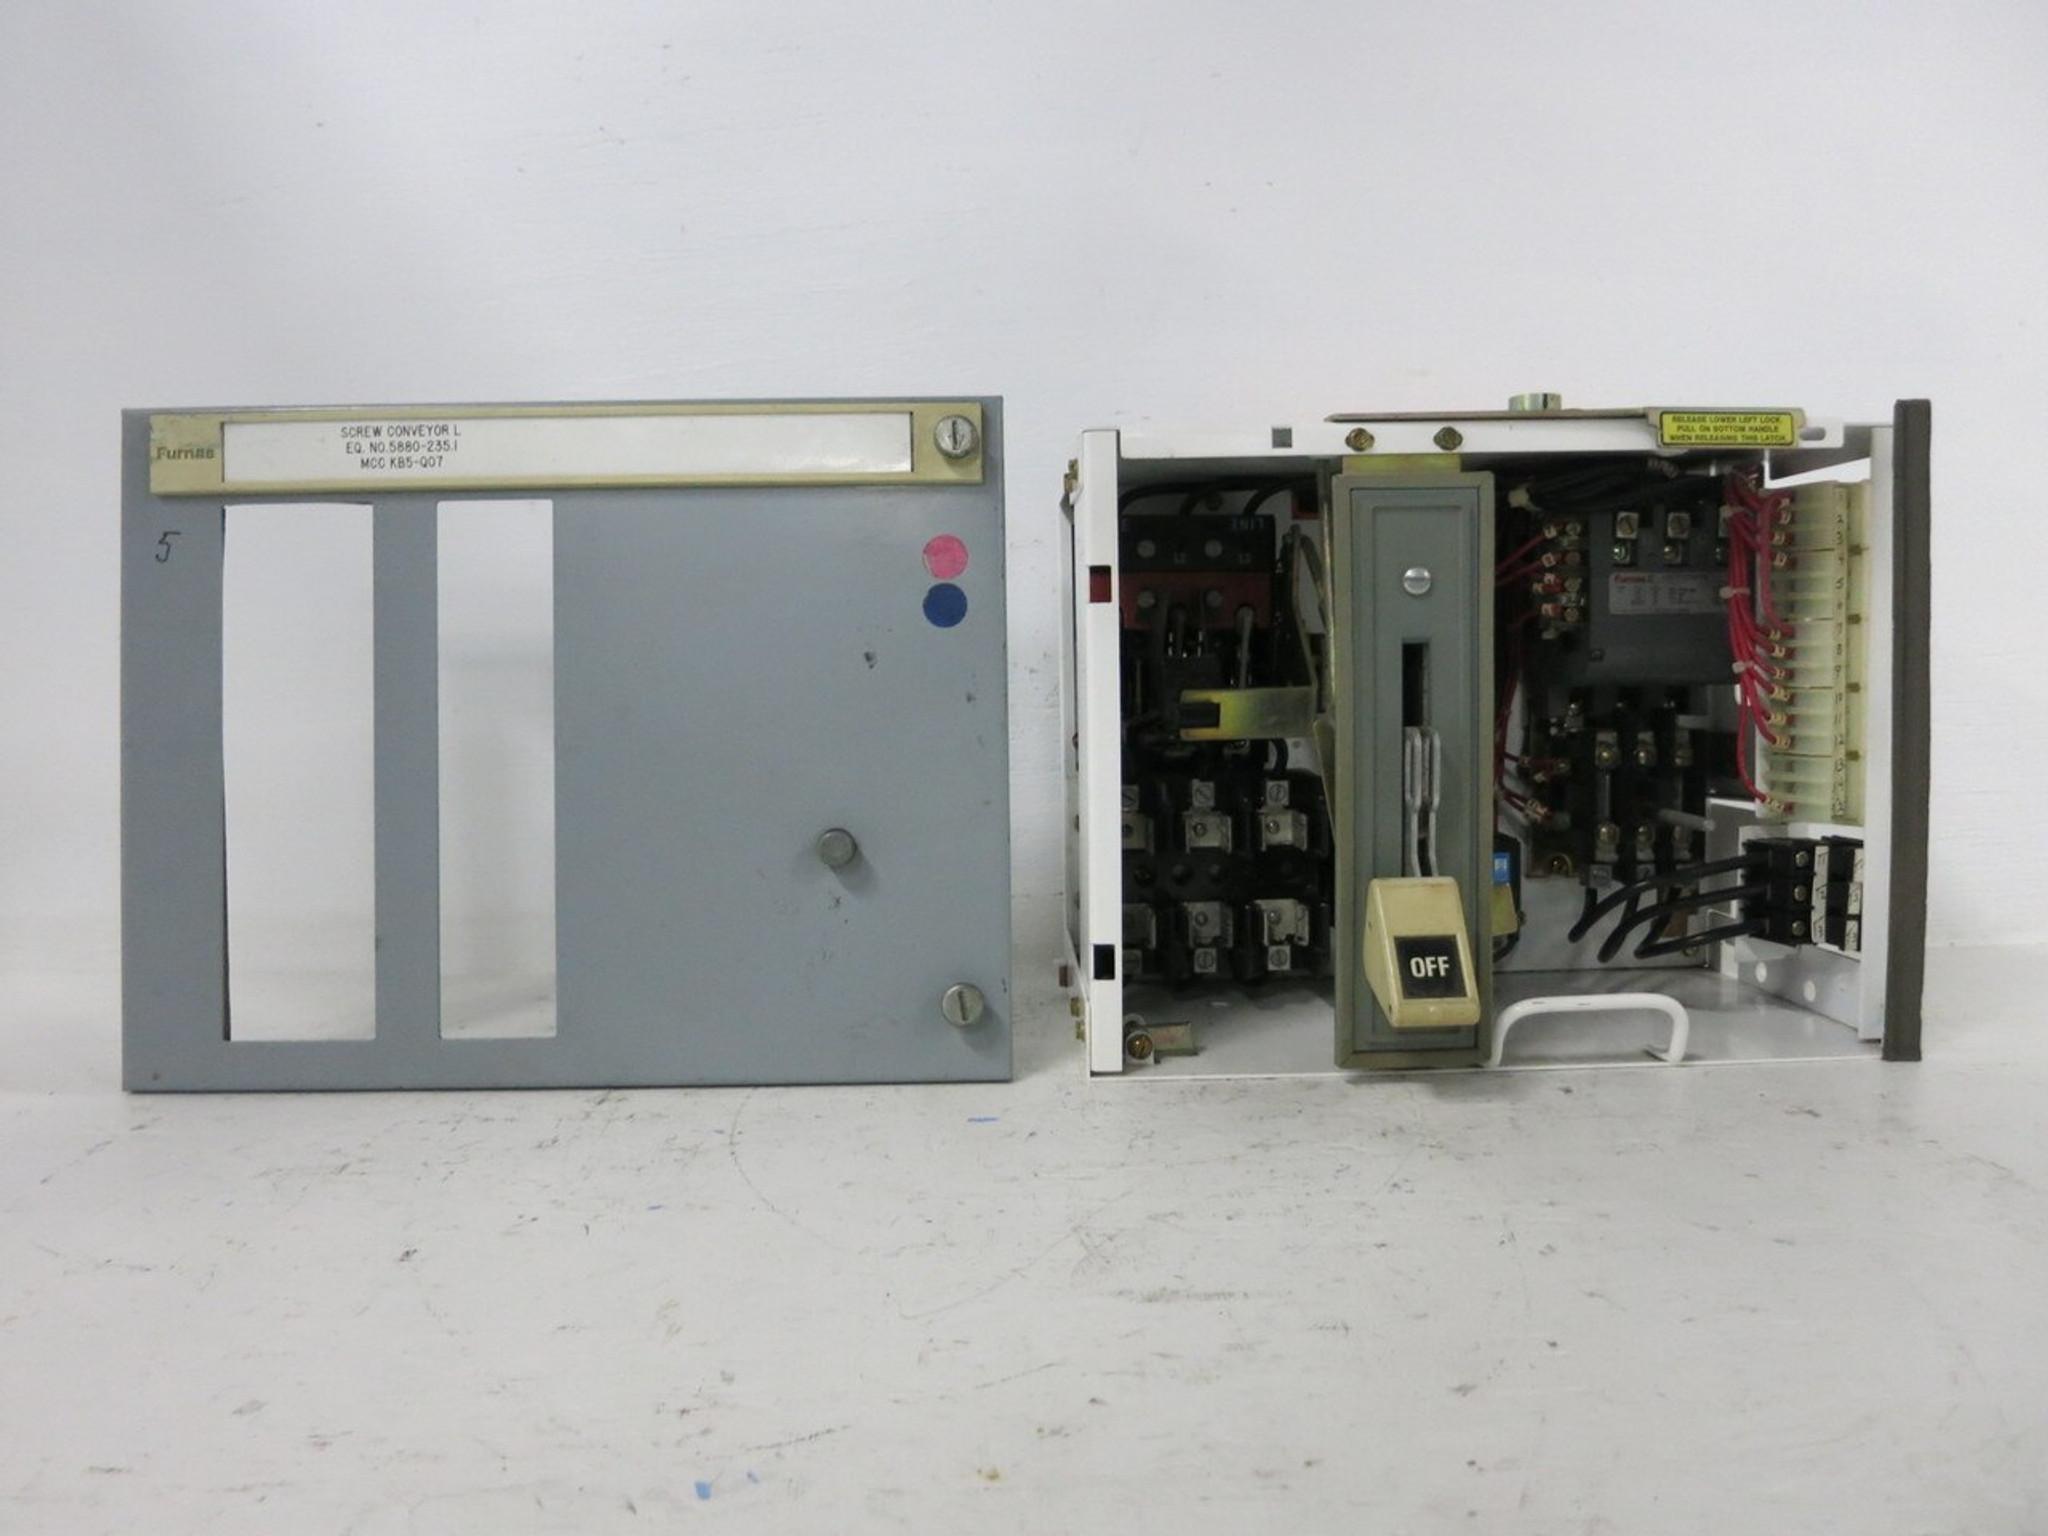 Siemens TiaStar & Furnas System89